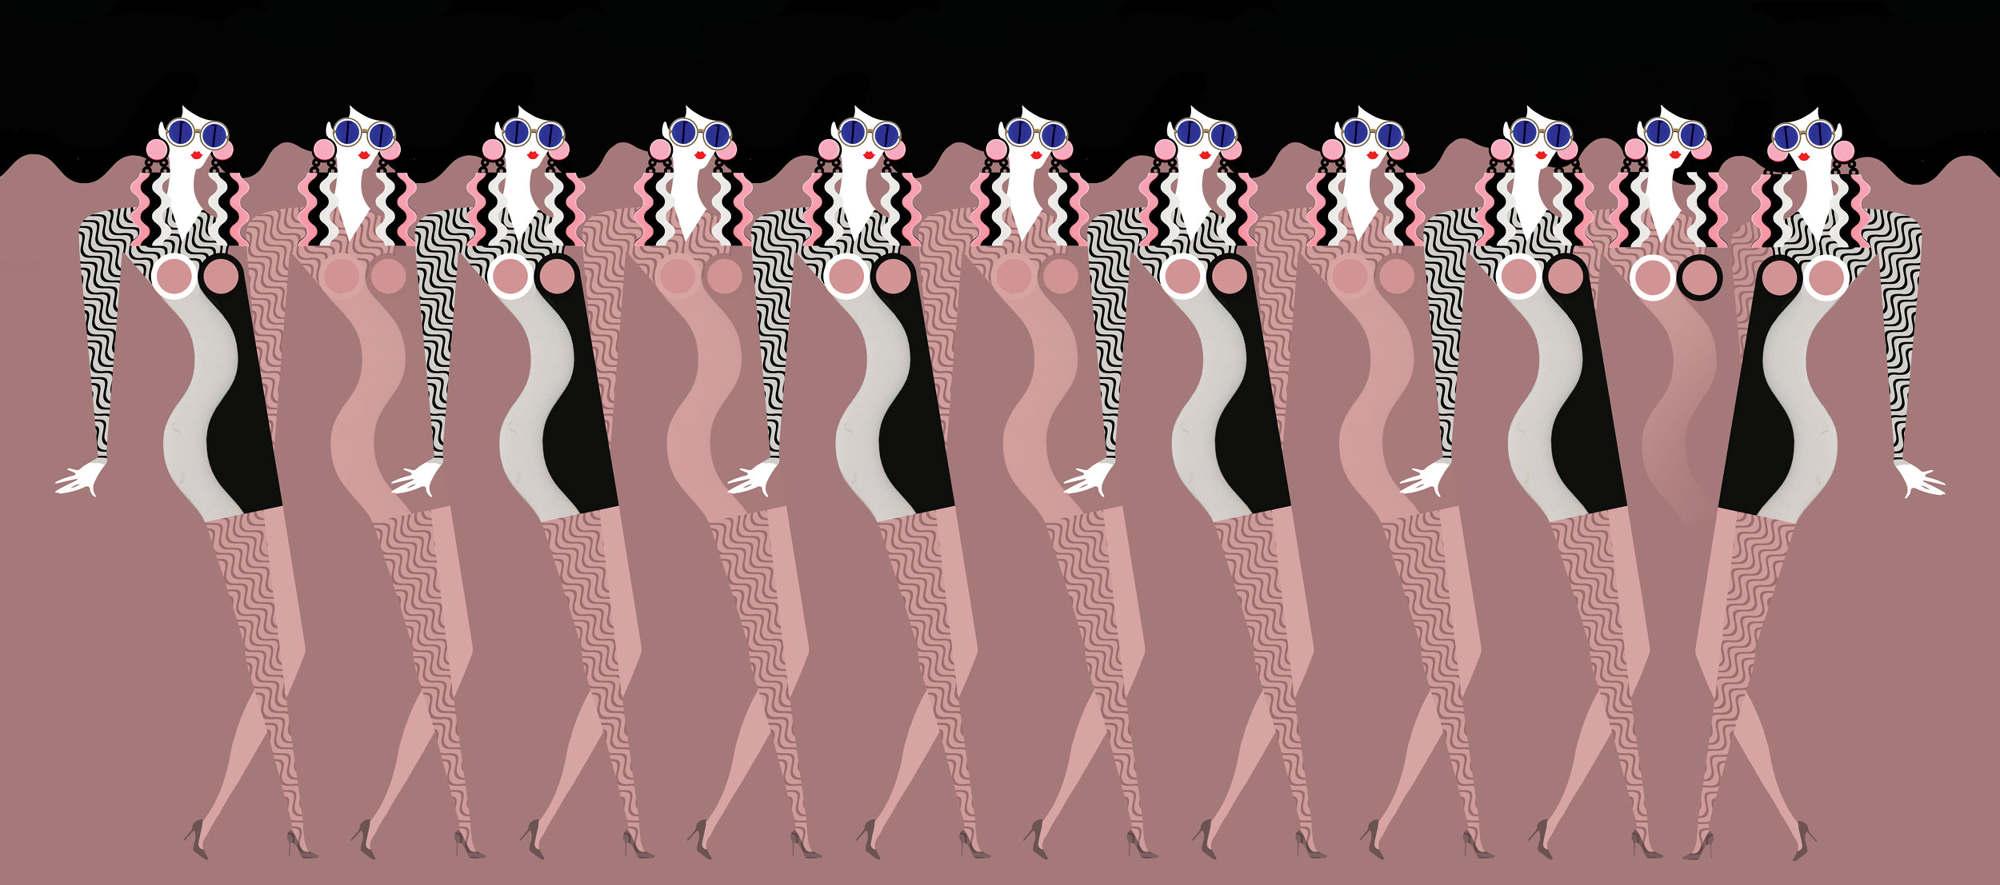 lesley-barnes-illustration-goodfromyou-7.jpg